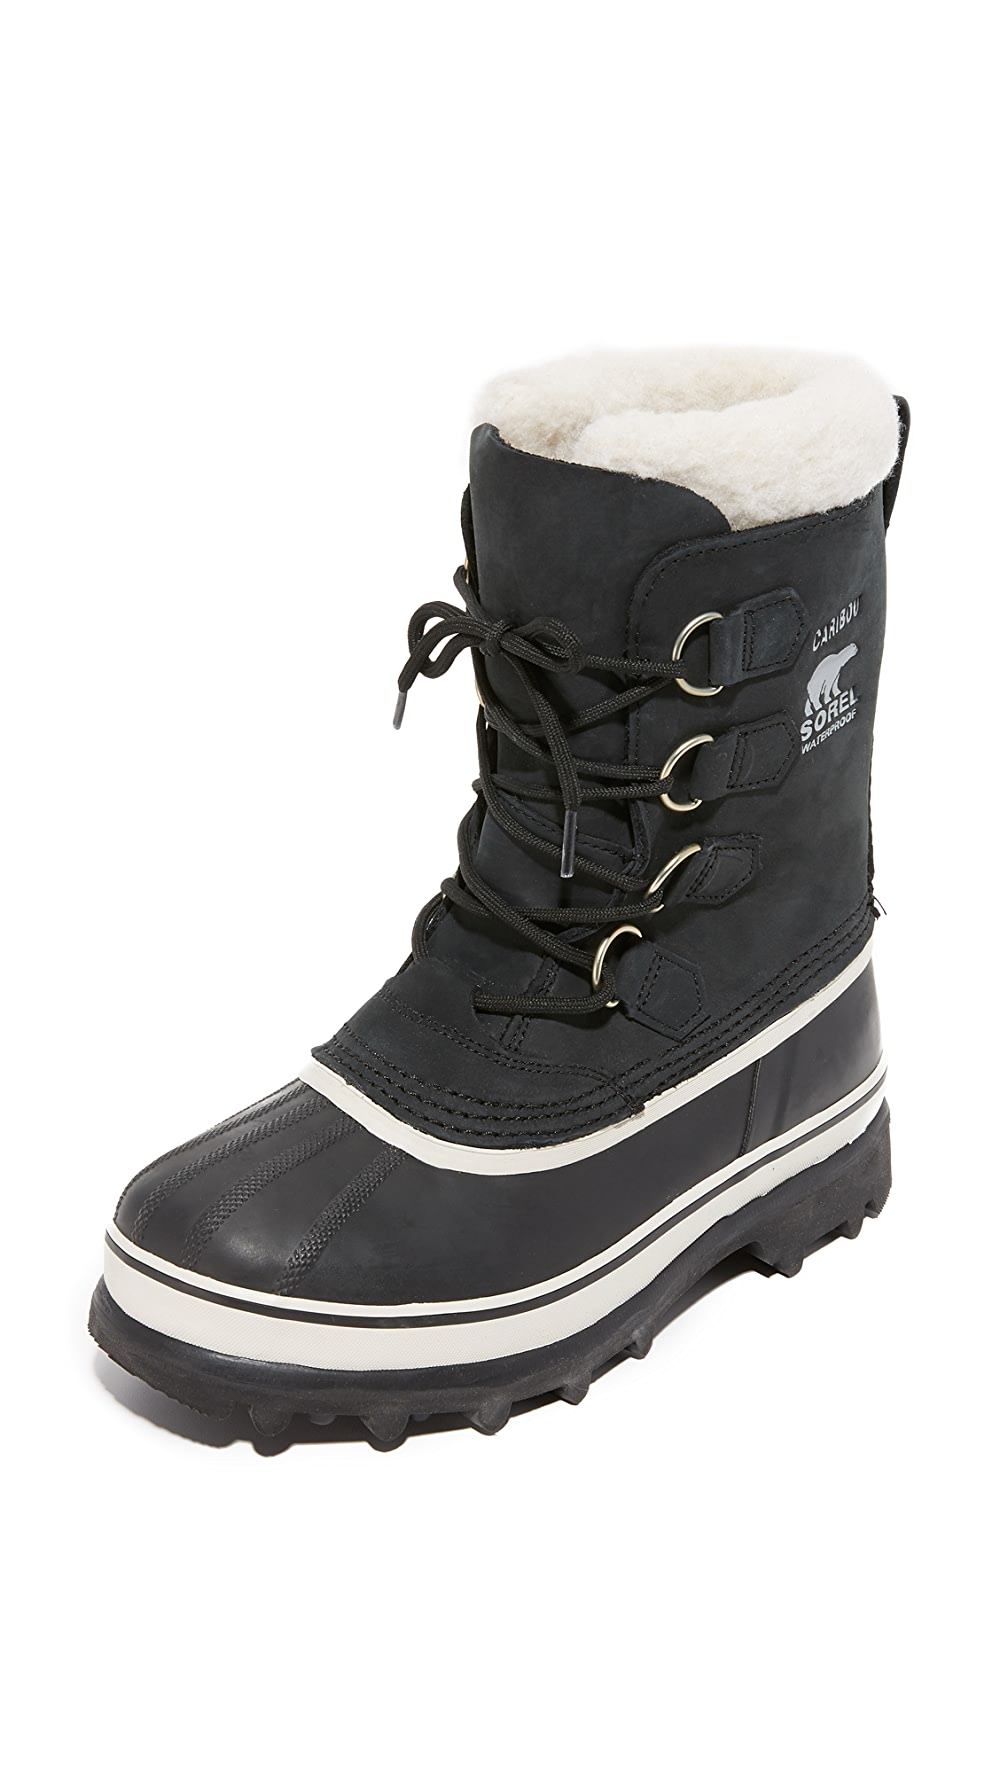 Objective Sorel - Caribou Boots Durable Modeling